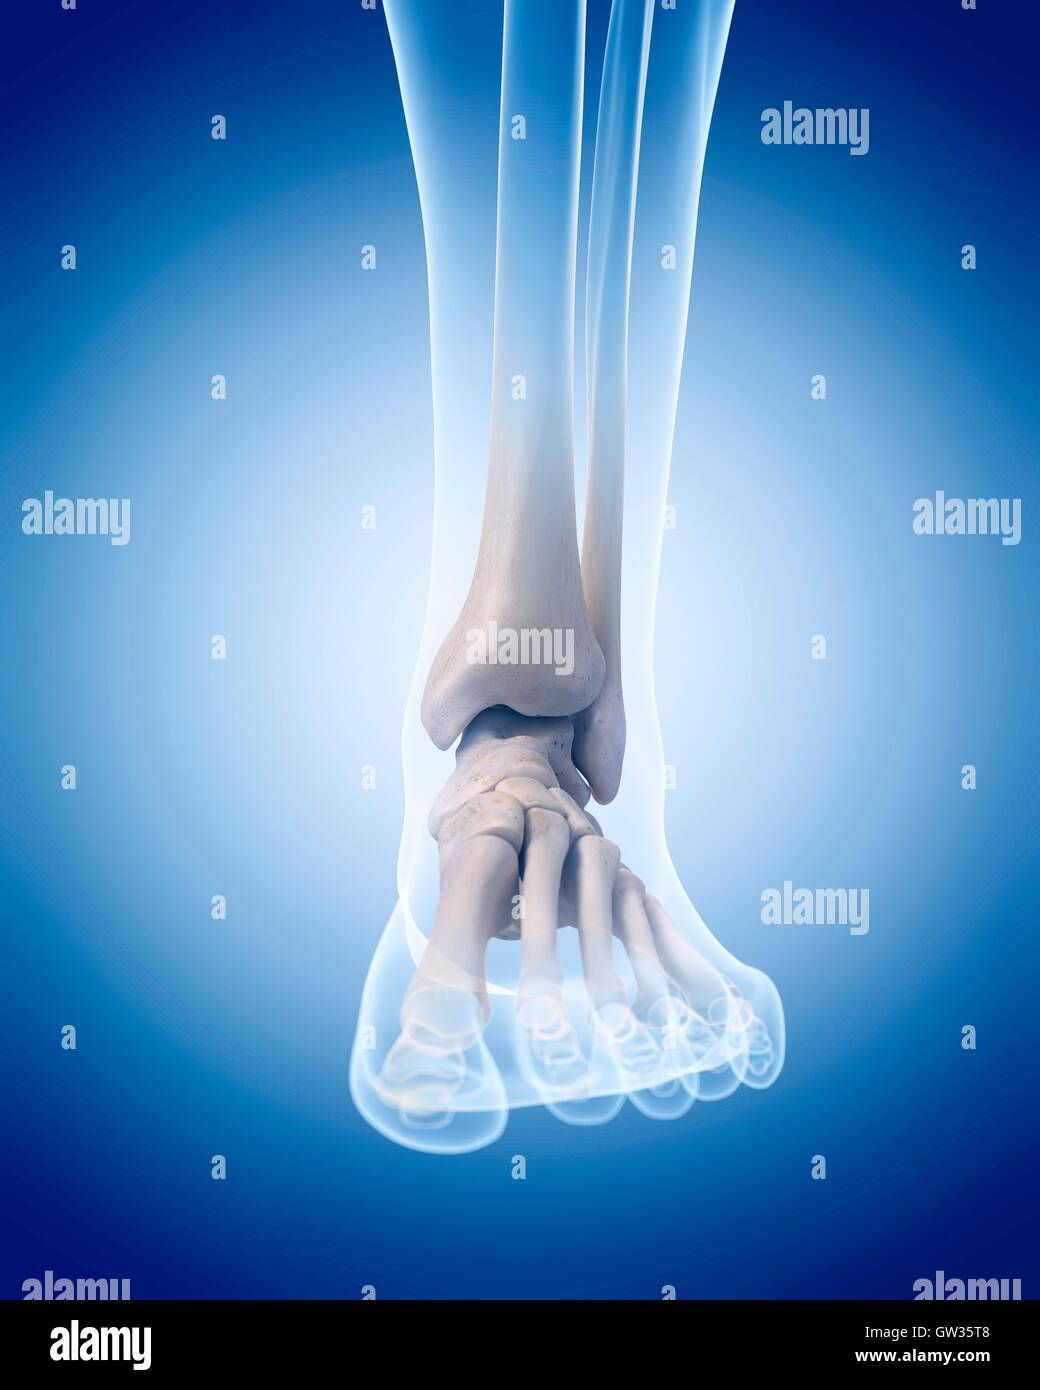 Human Ankle Bones Stockfotos & Human Ankle Bones Bilder - Alamy